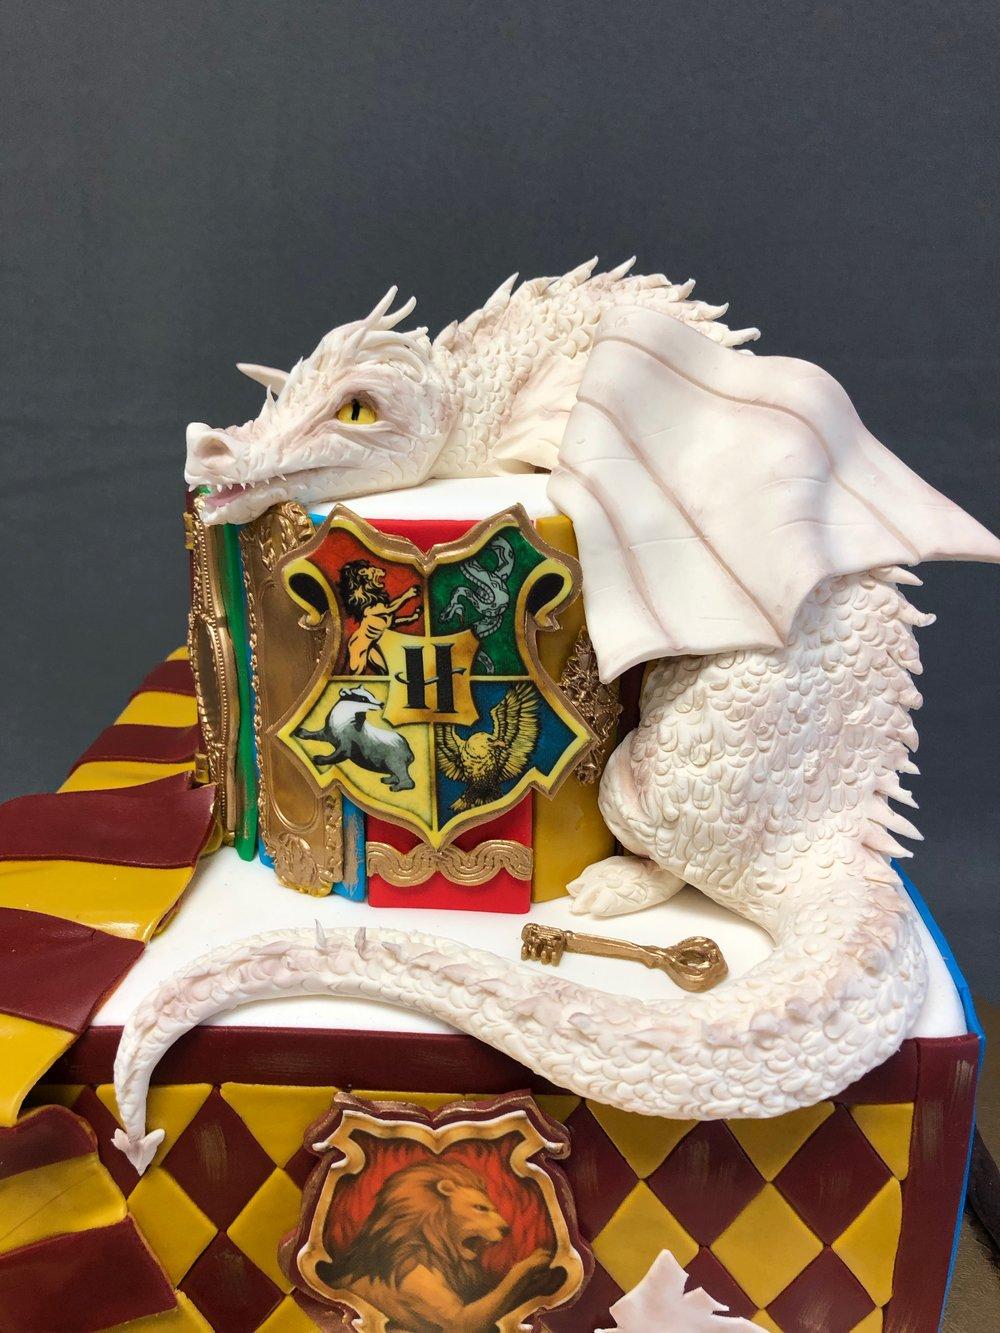 Harry Potter Themed Birthday Cake New Jersey